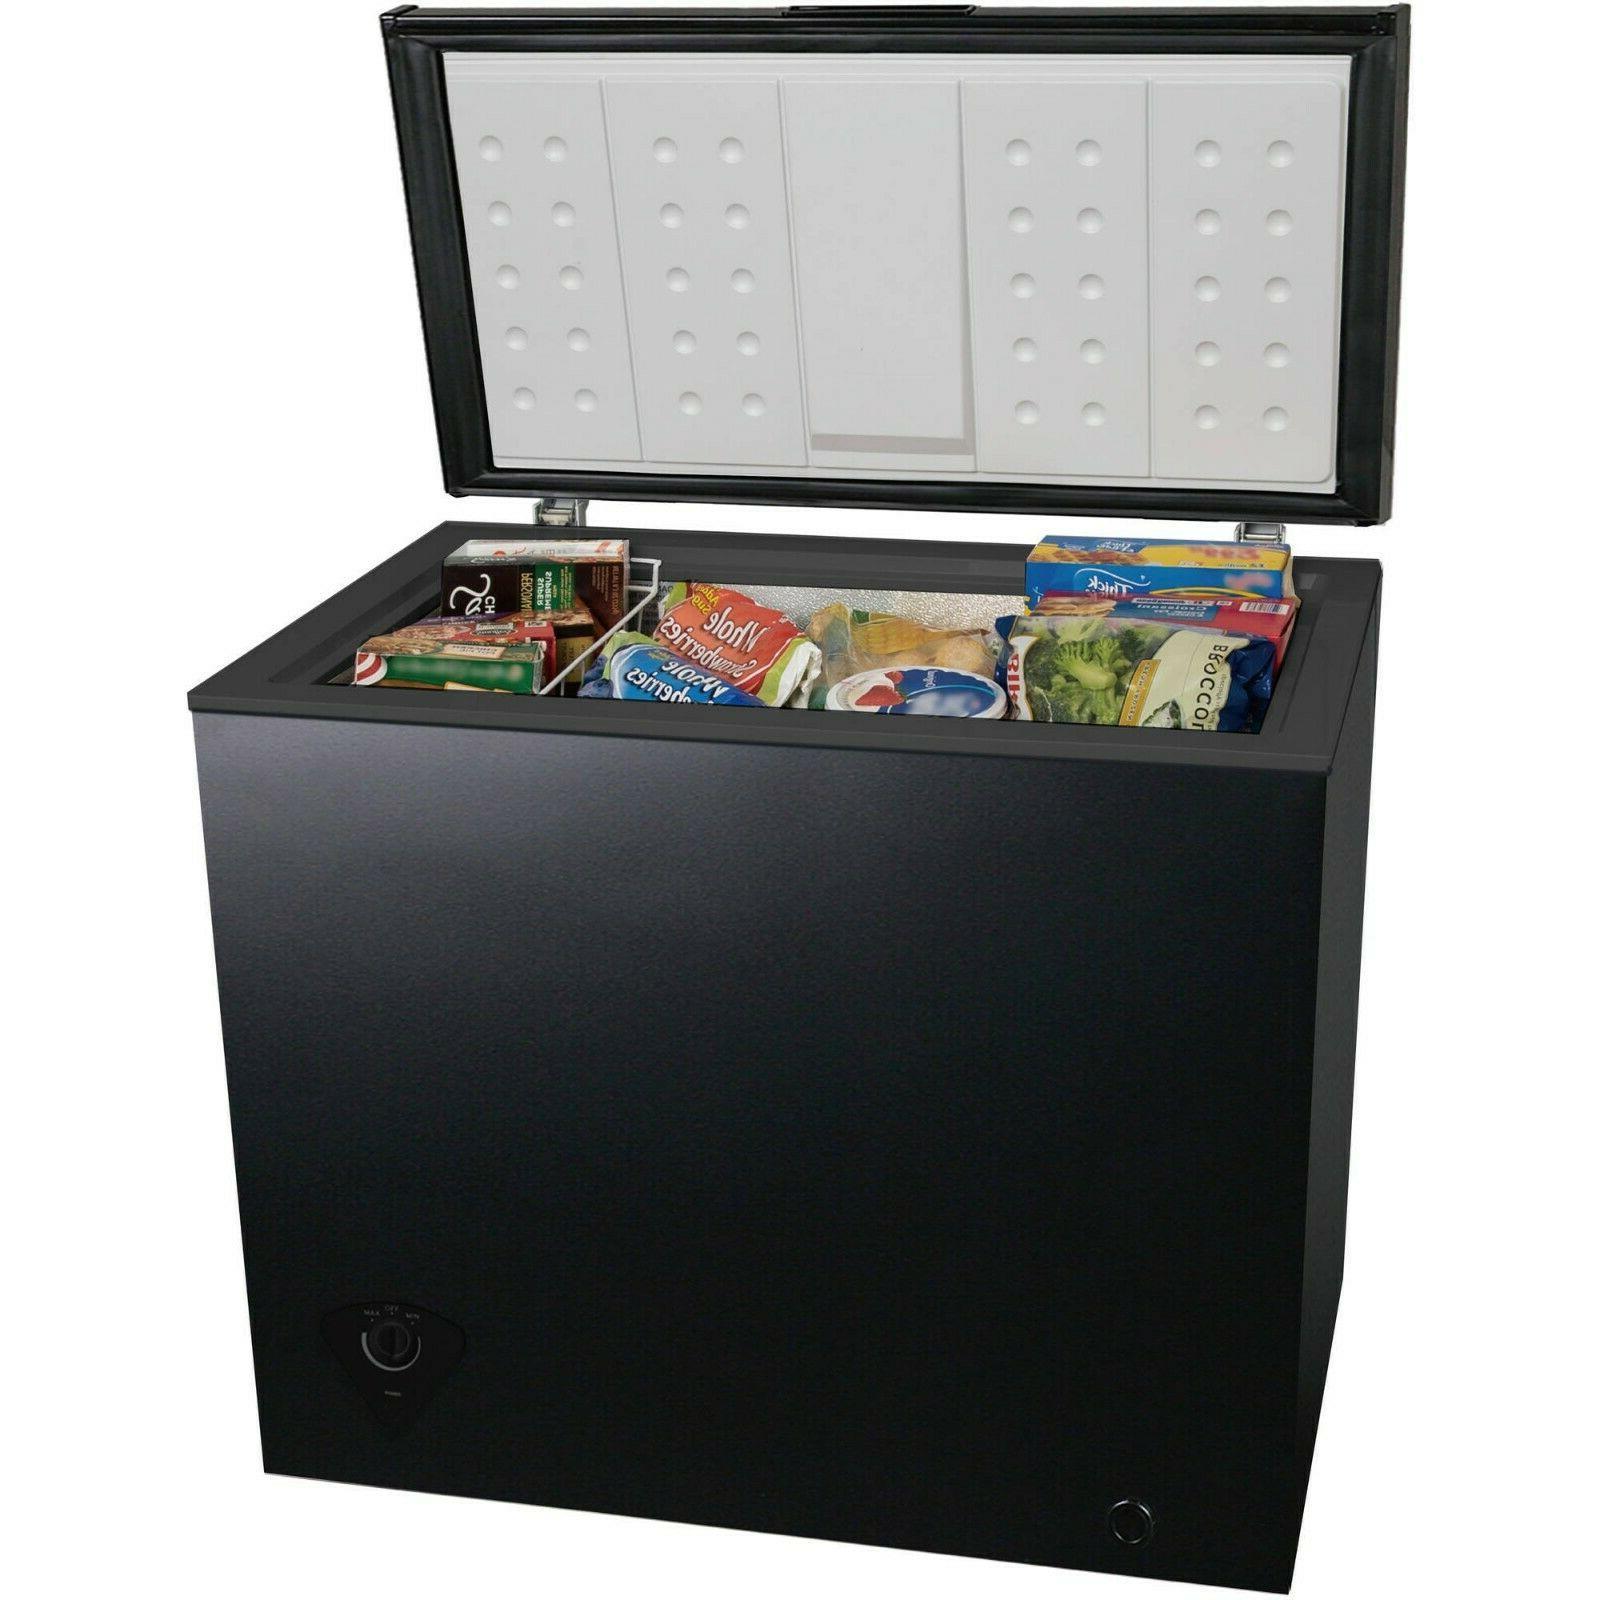 Chest Deep Freezer 7 Cu Ft Compact Dorm Upright Apartment Ho